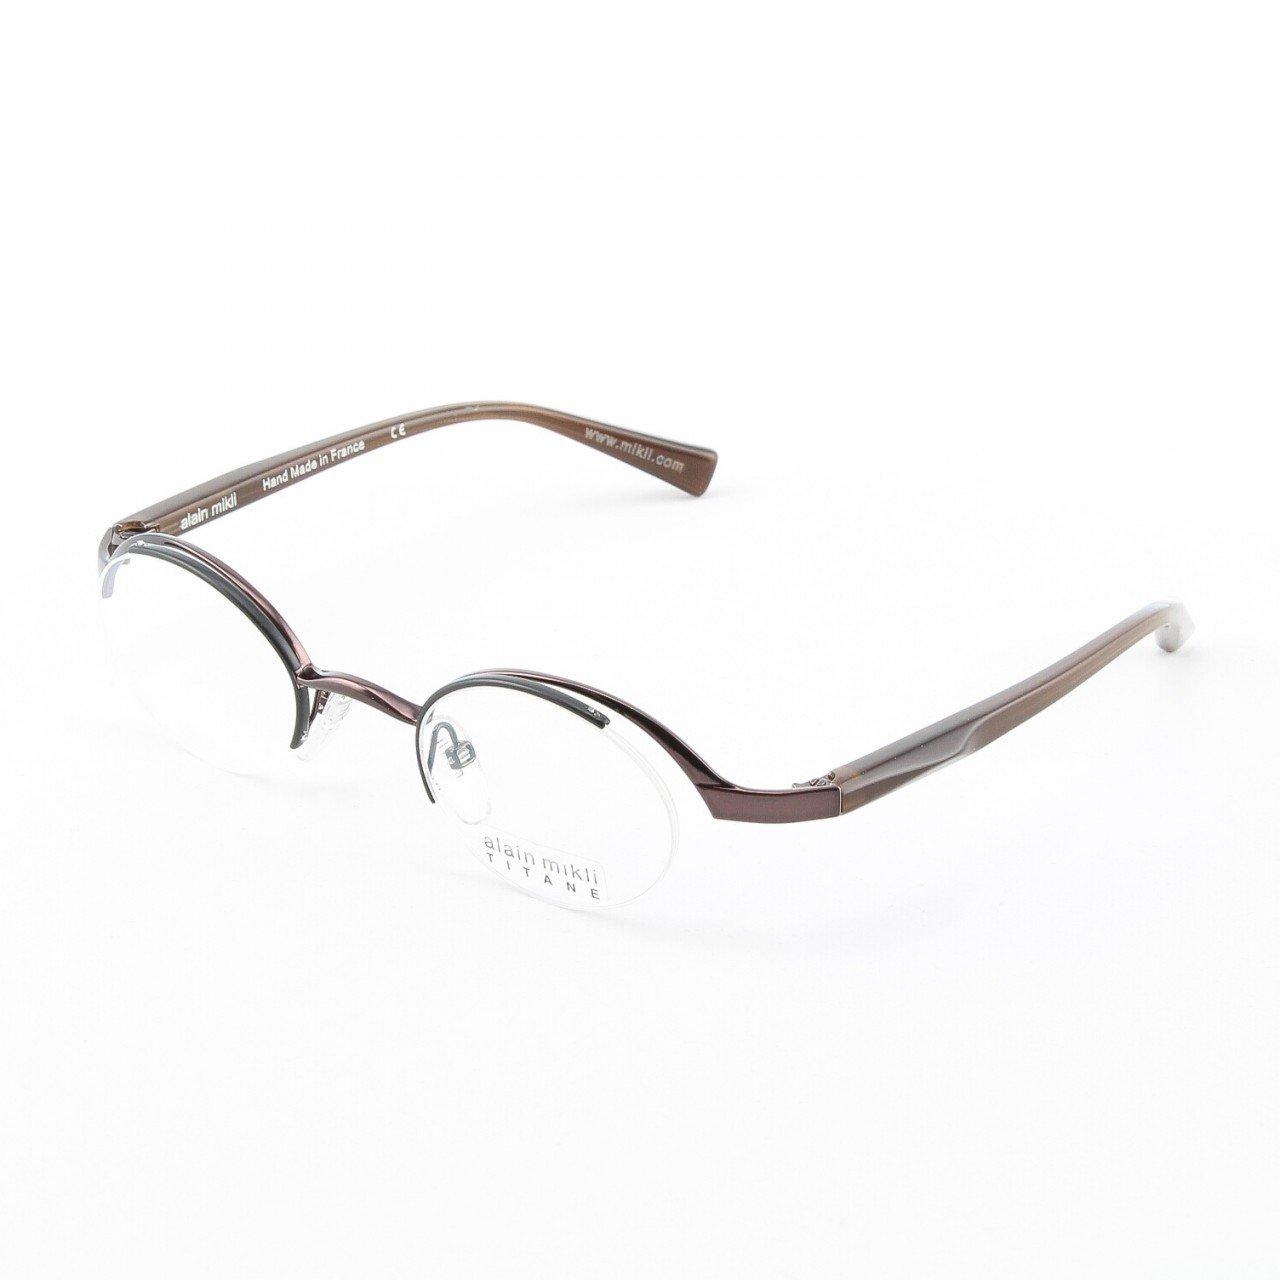 Alain Mikli Eyeglasses AL0552 Col. 12 Dark Amethist Frame with Amber Temples